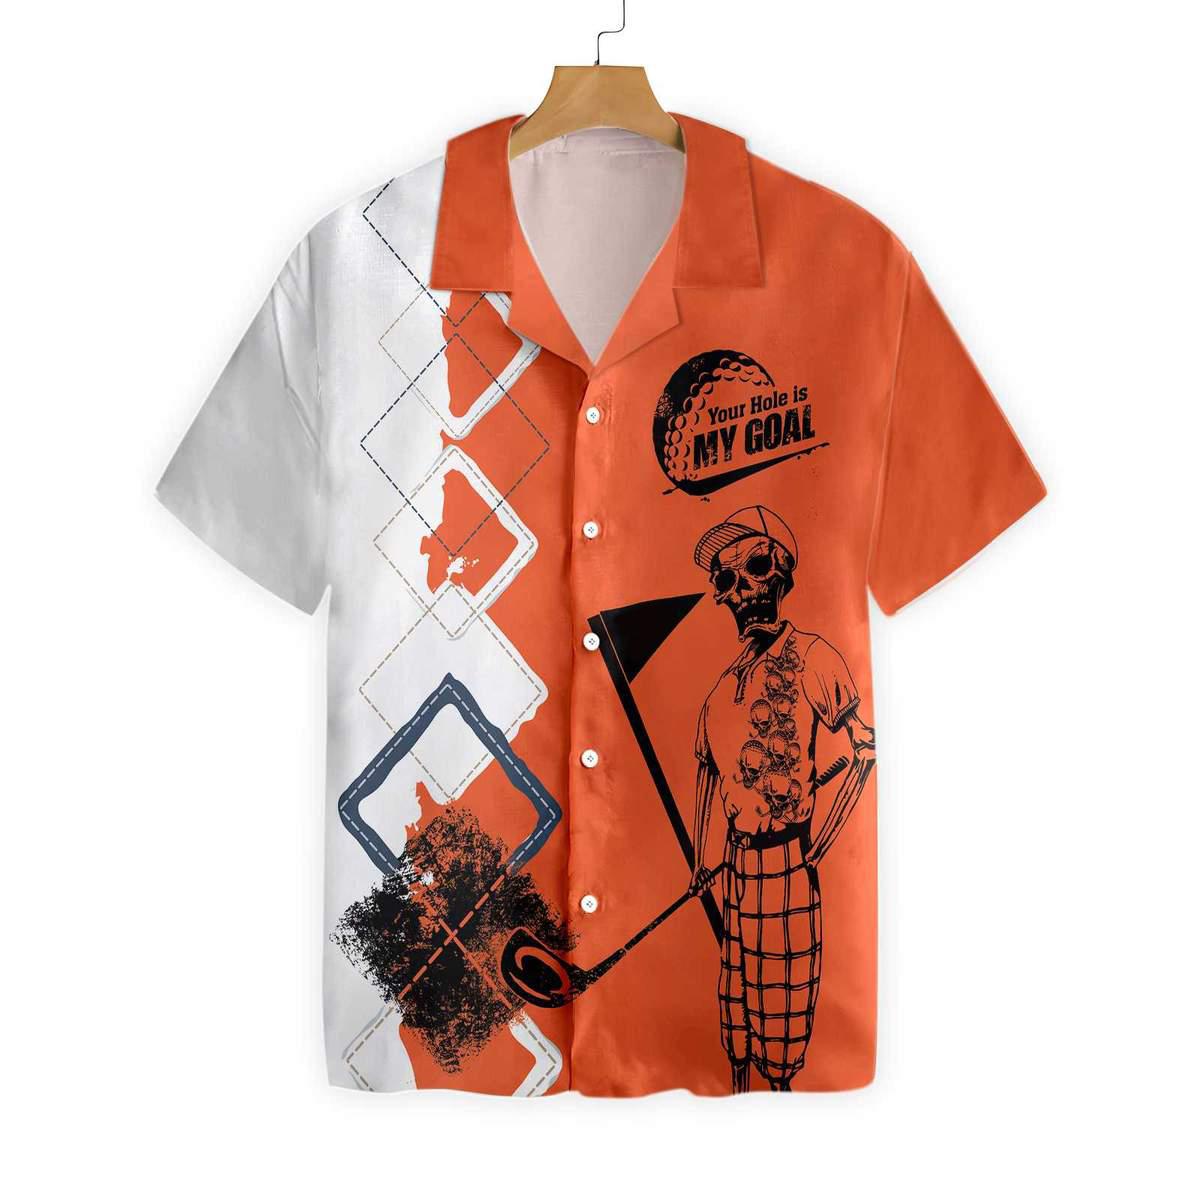 Skeleton Golf Your Hole Is My Goal Hawaiian Shirt